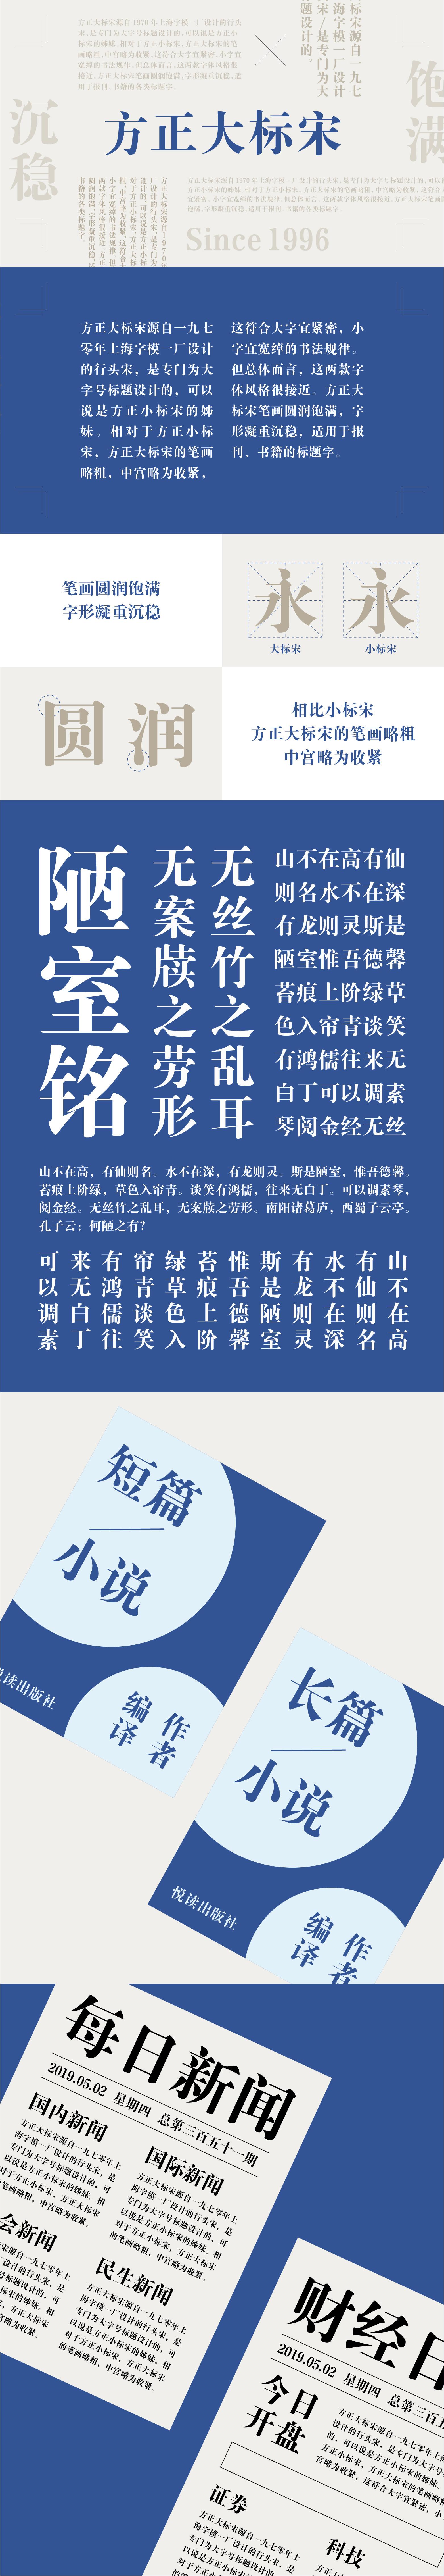 https://cdn1.zijia.com.cn/Public/Uploads/mainsort/mainsort_1592559605_2486.jpg